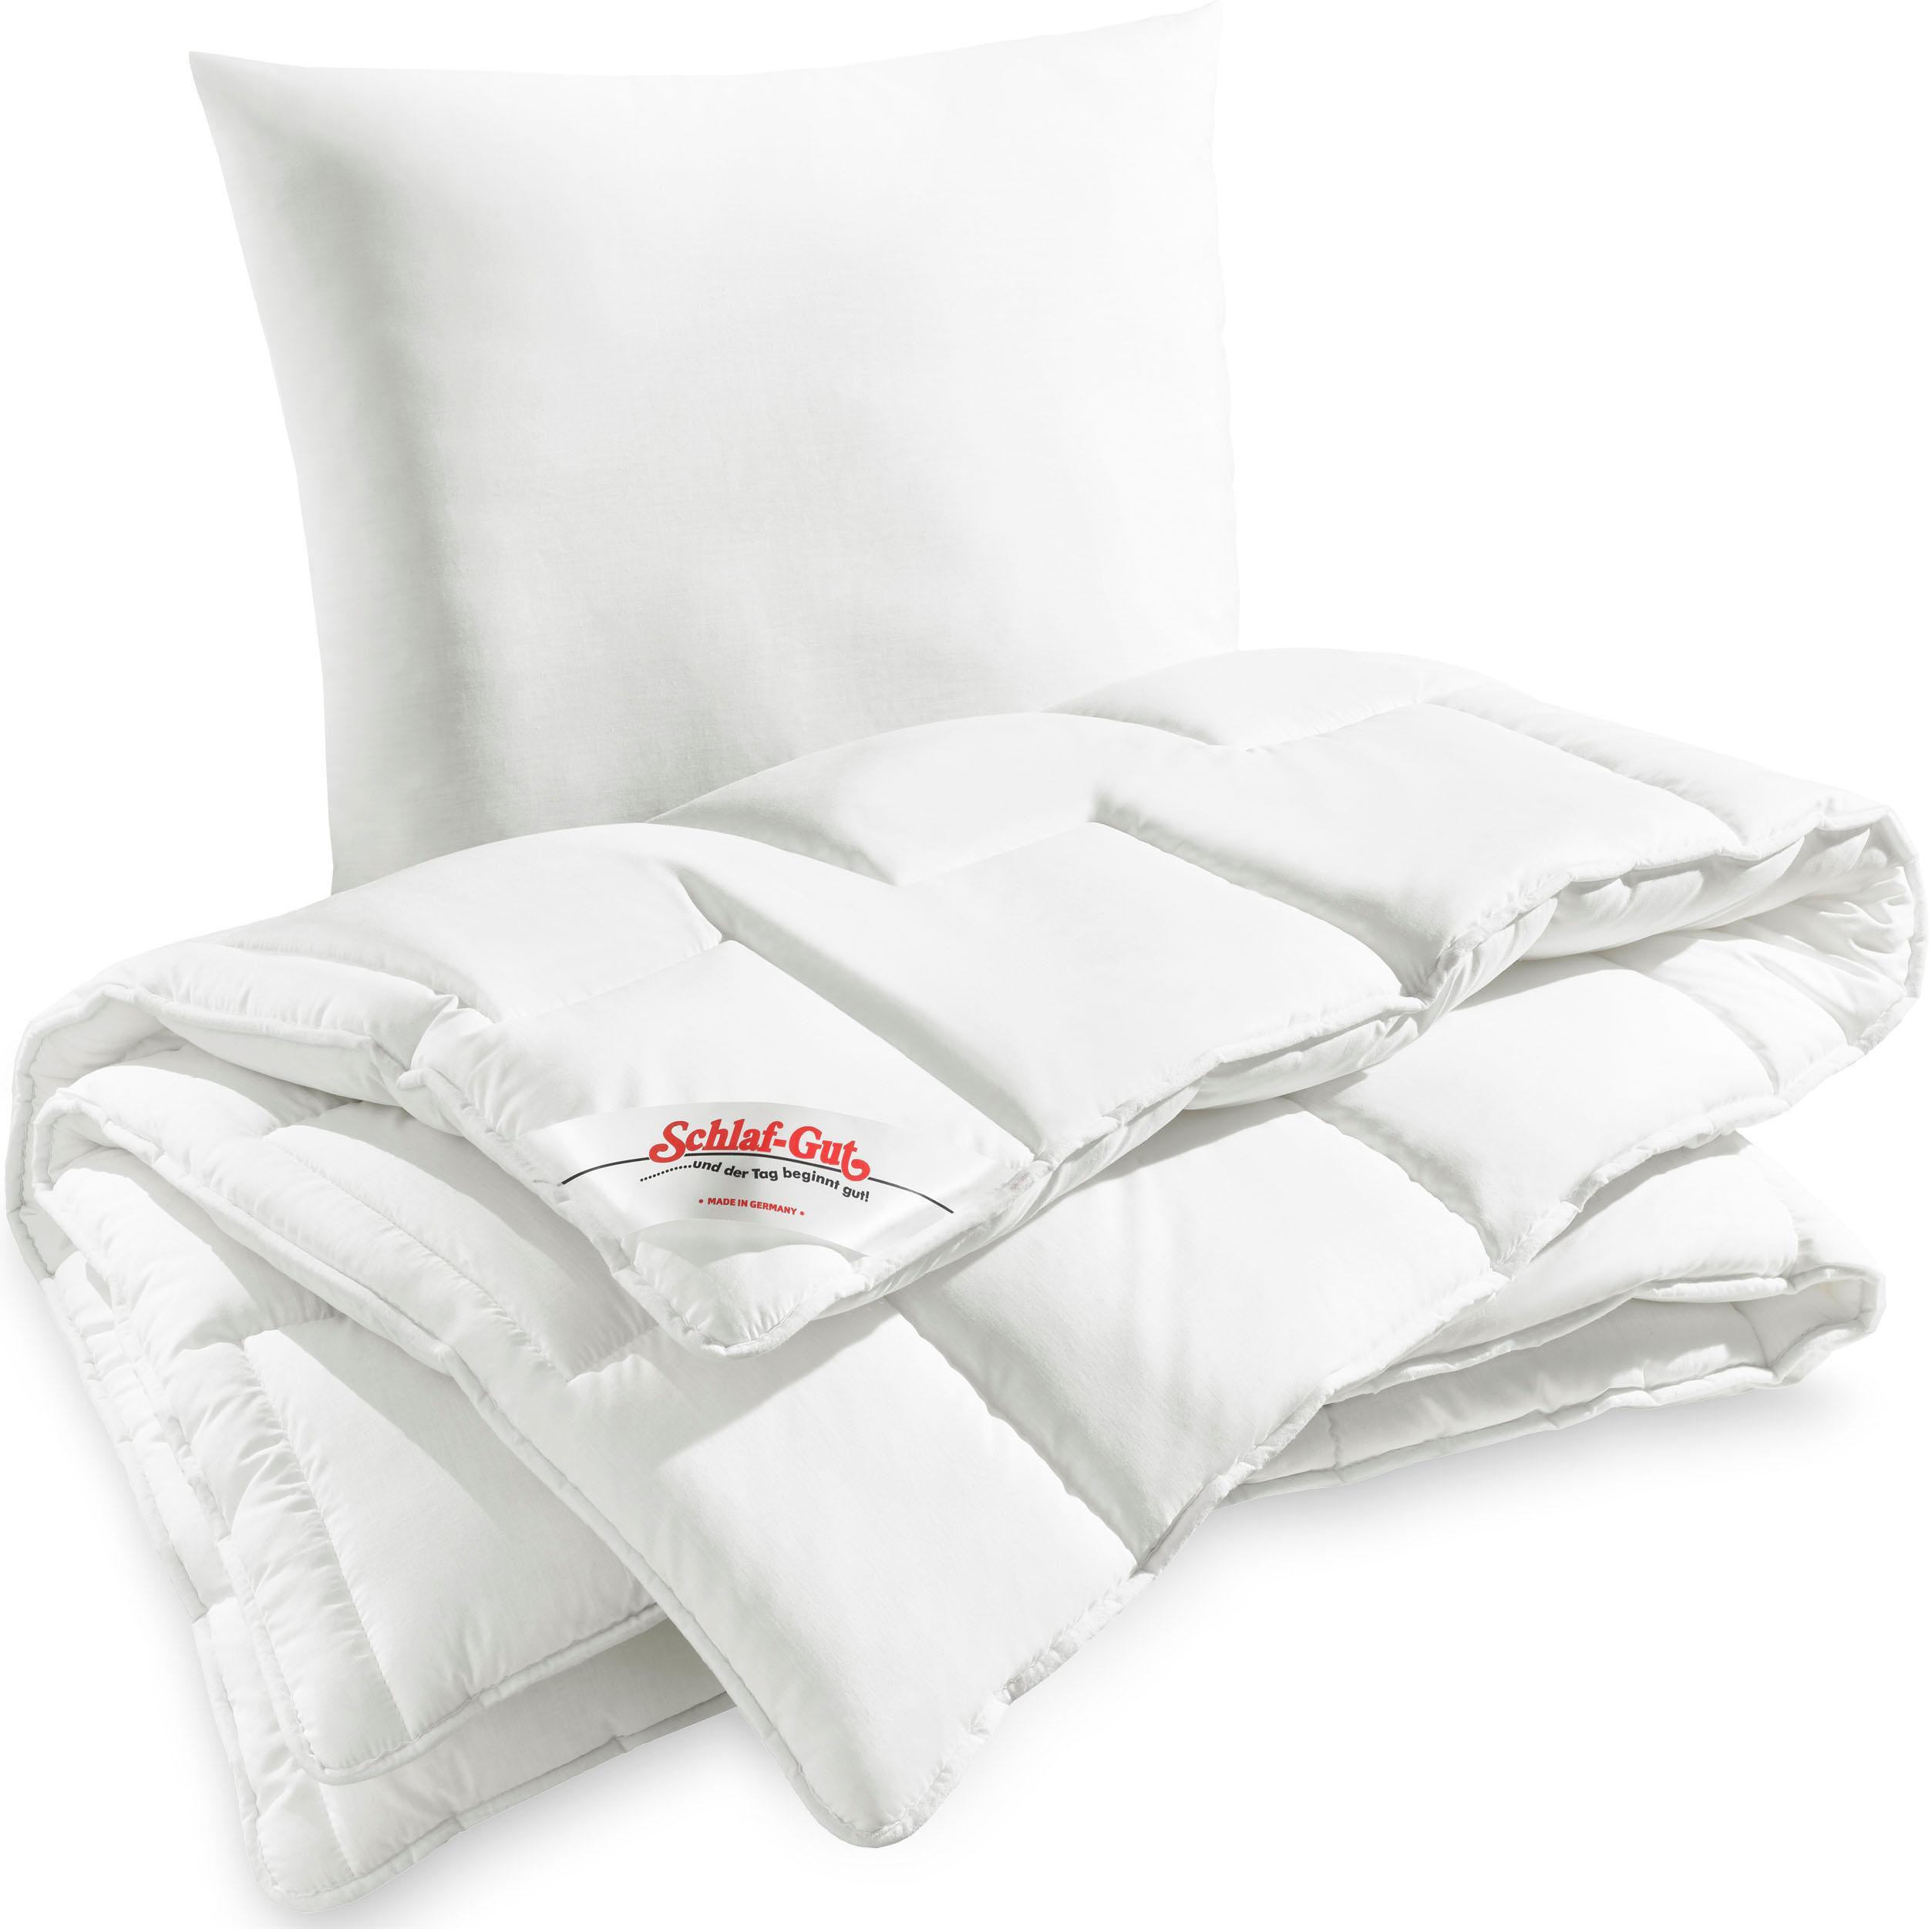 Bettdecke + Kopfkissen Utah Schlaf-Gut normal Füllung: Schlaf-Gut Polytherm